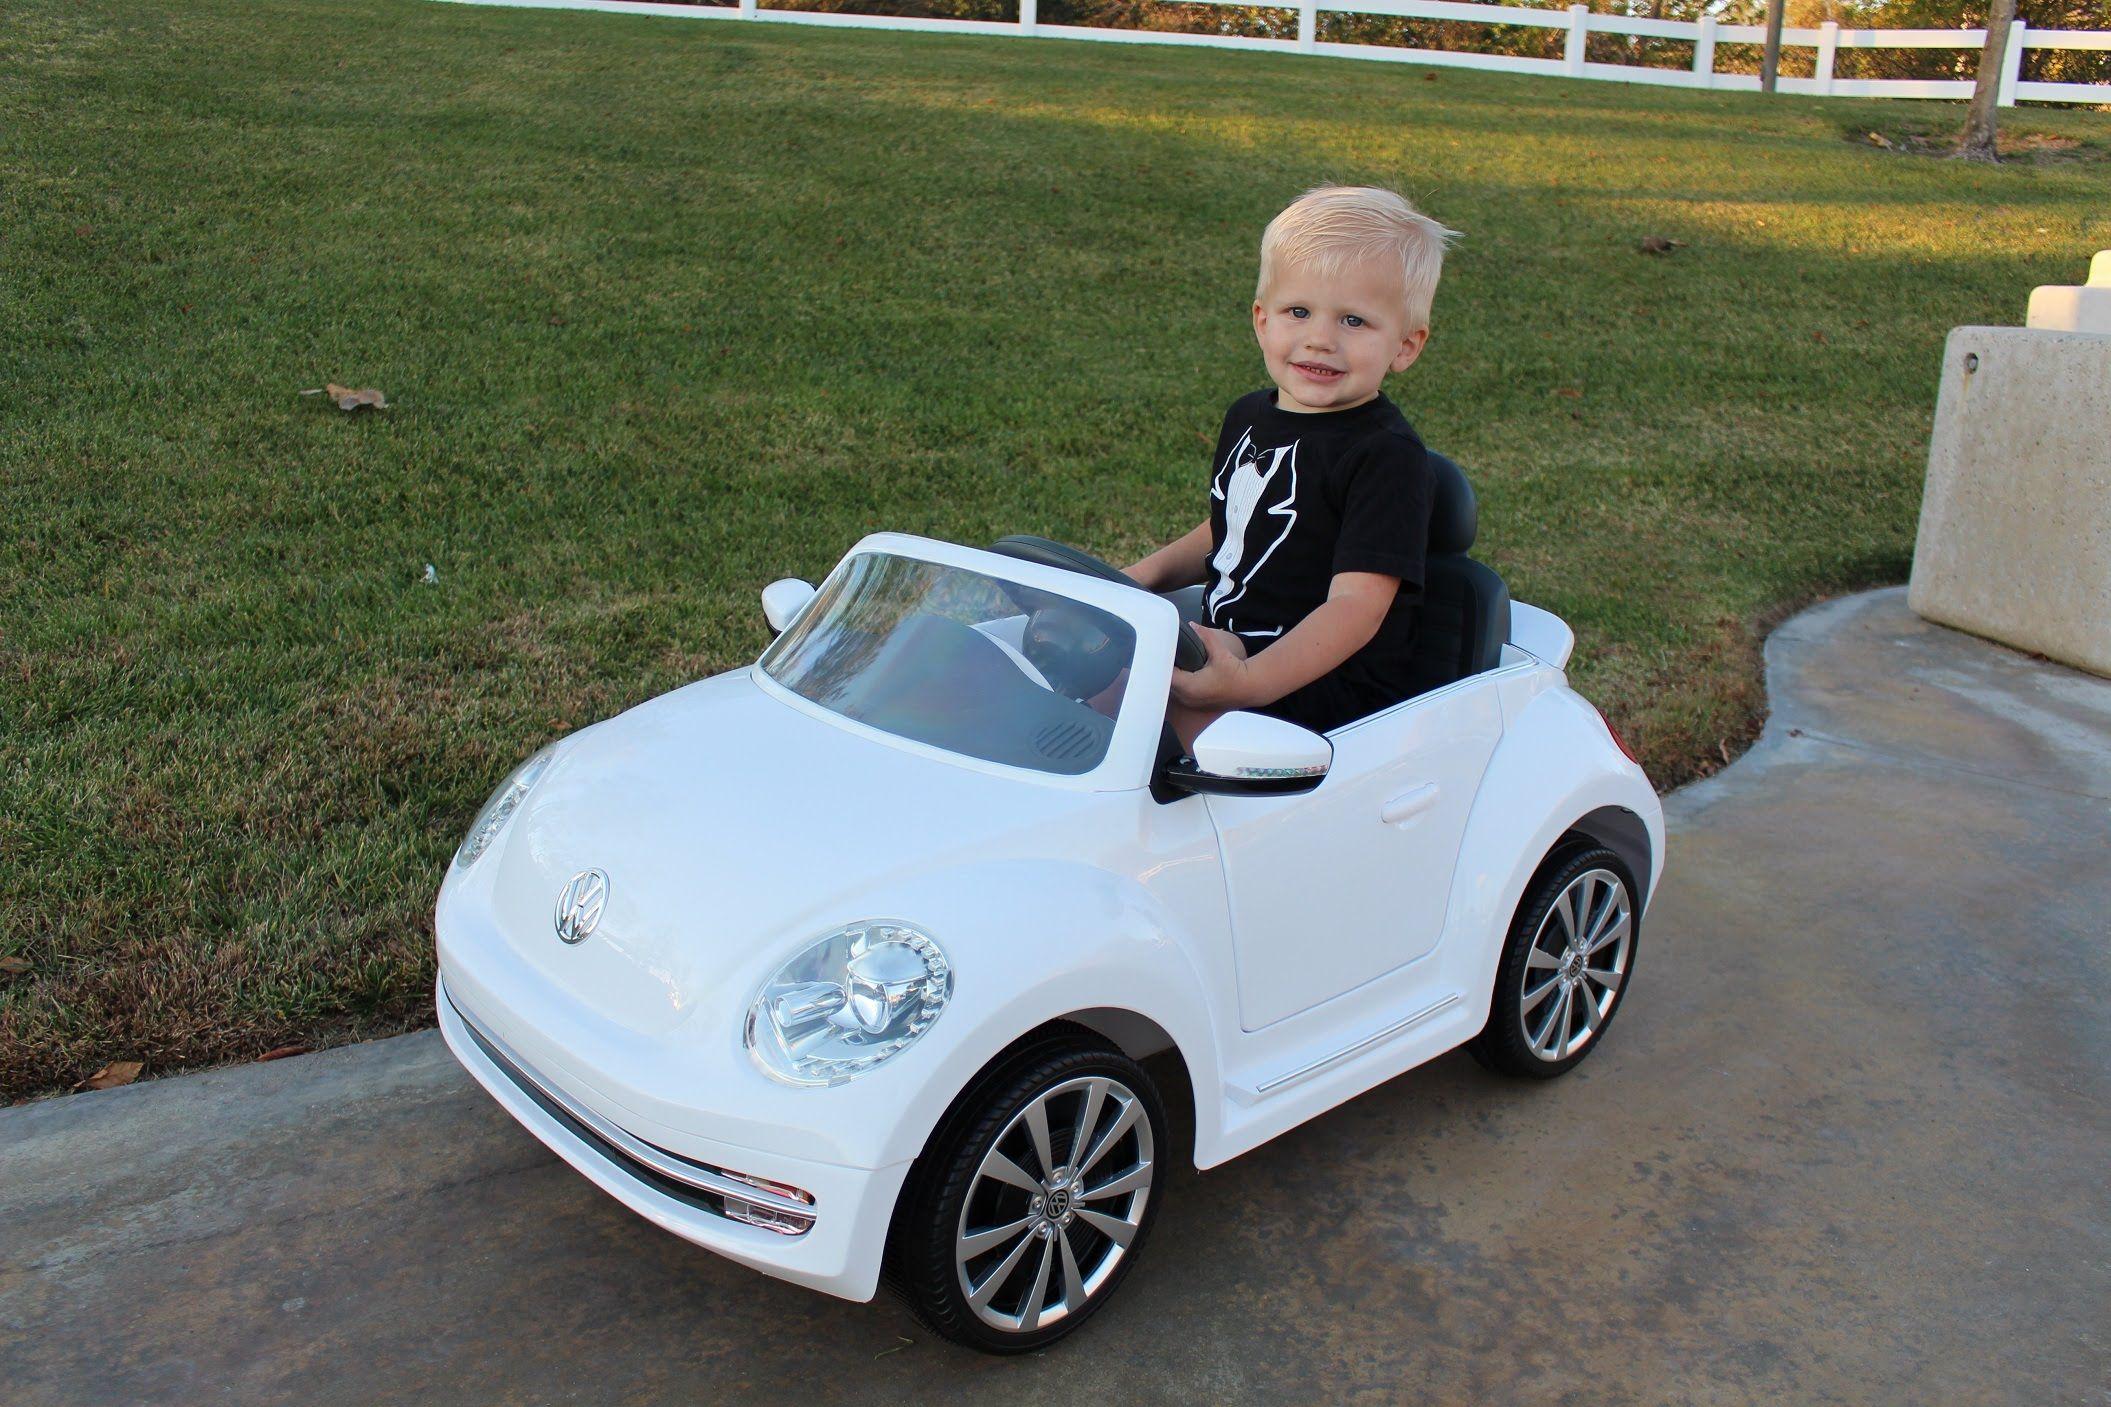 pretty nice vw bug ride on car lightning mcqueen power wheels race